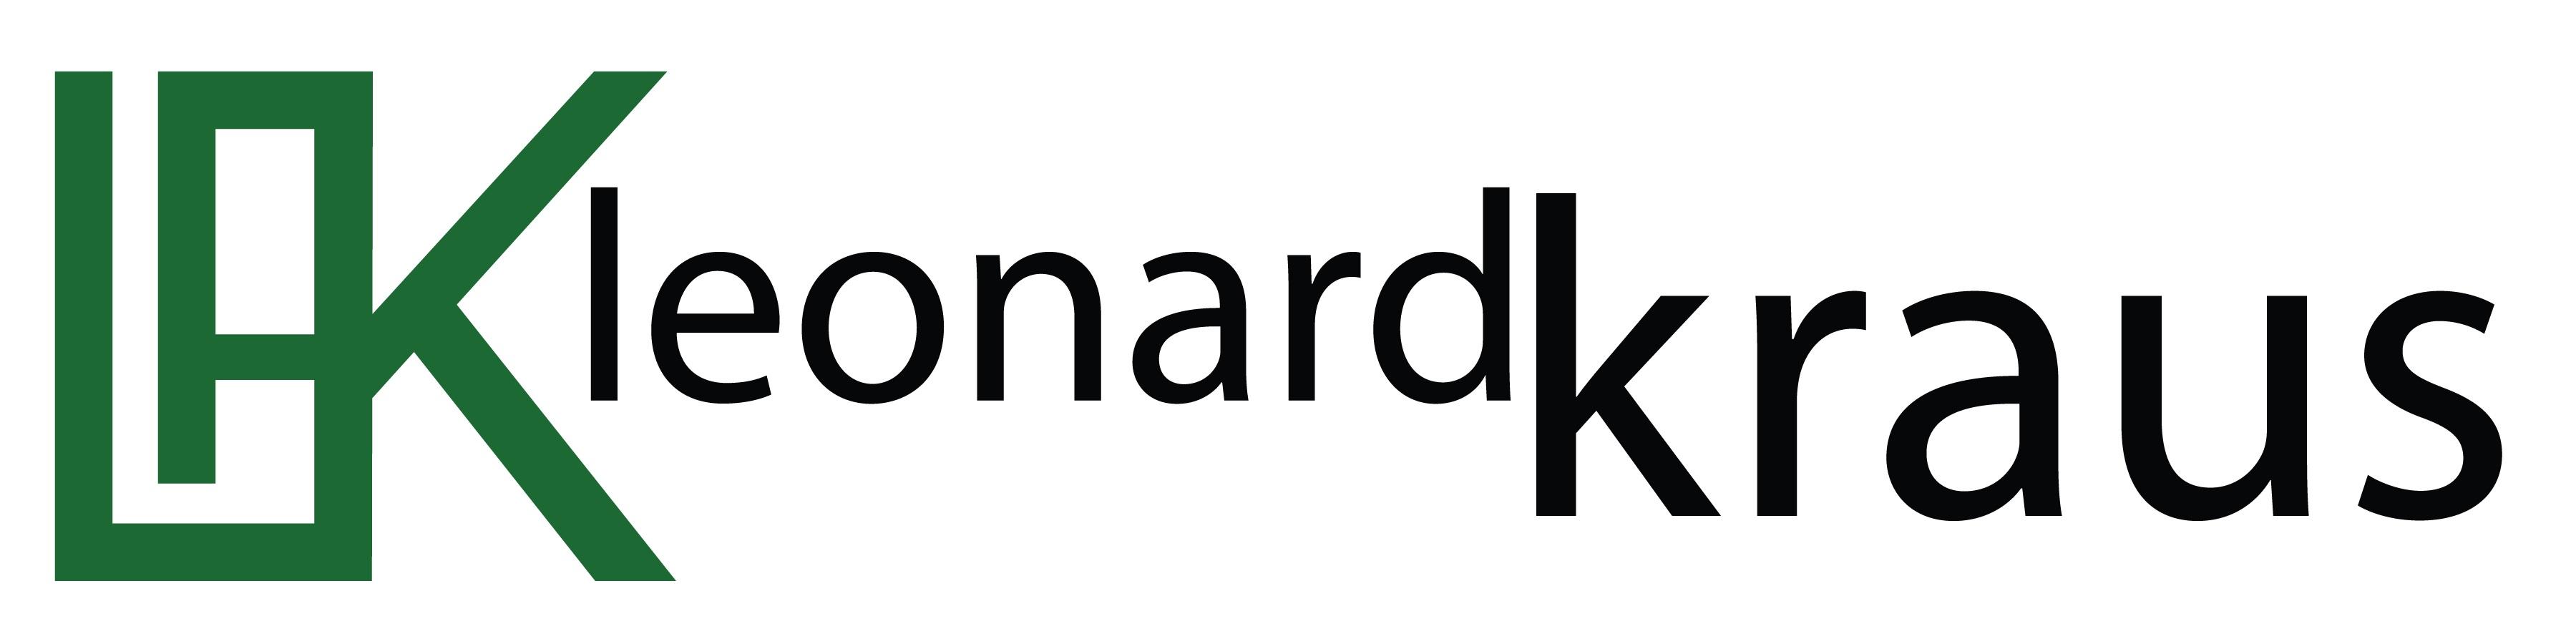 Leonard A Kraus & Co logo